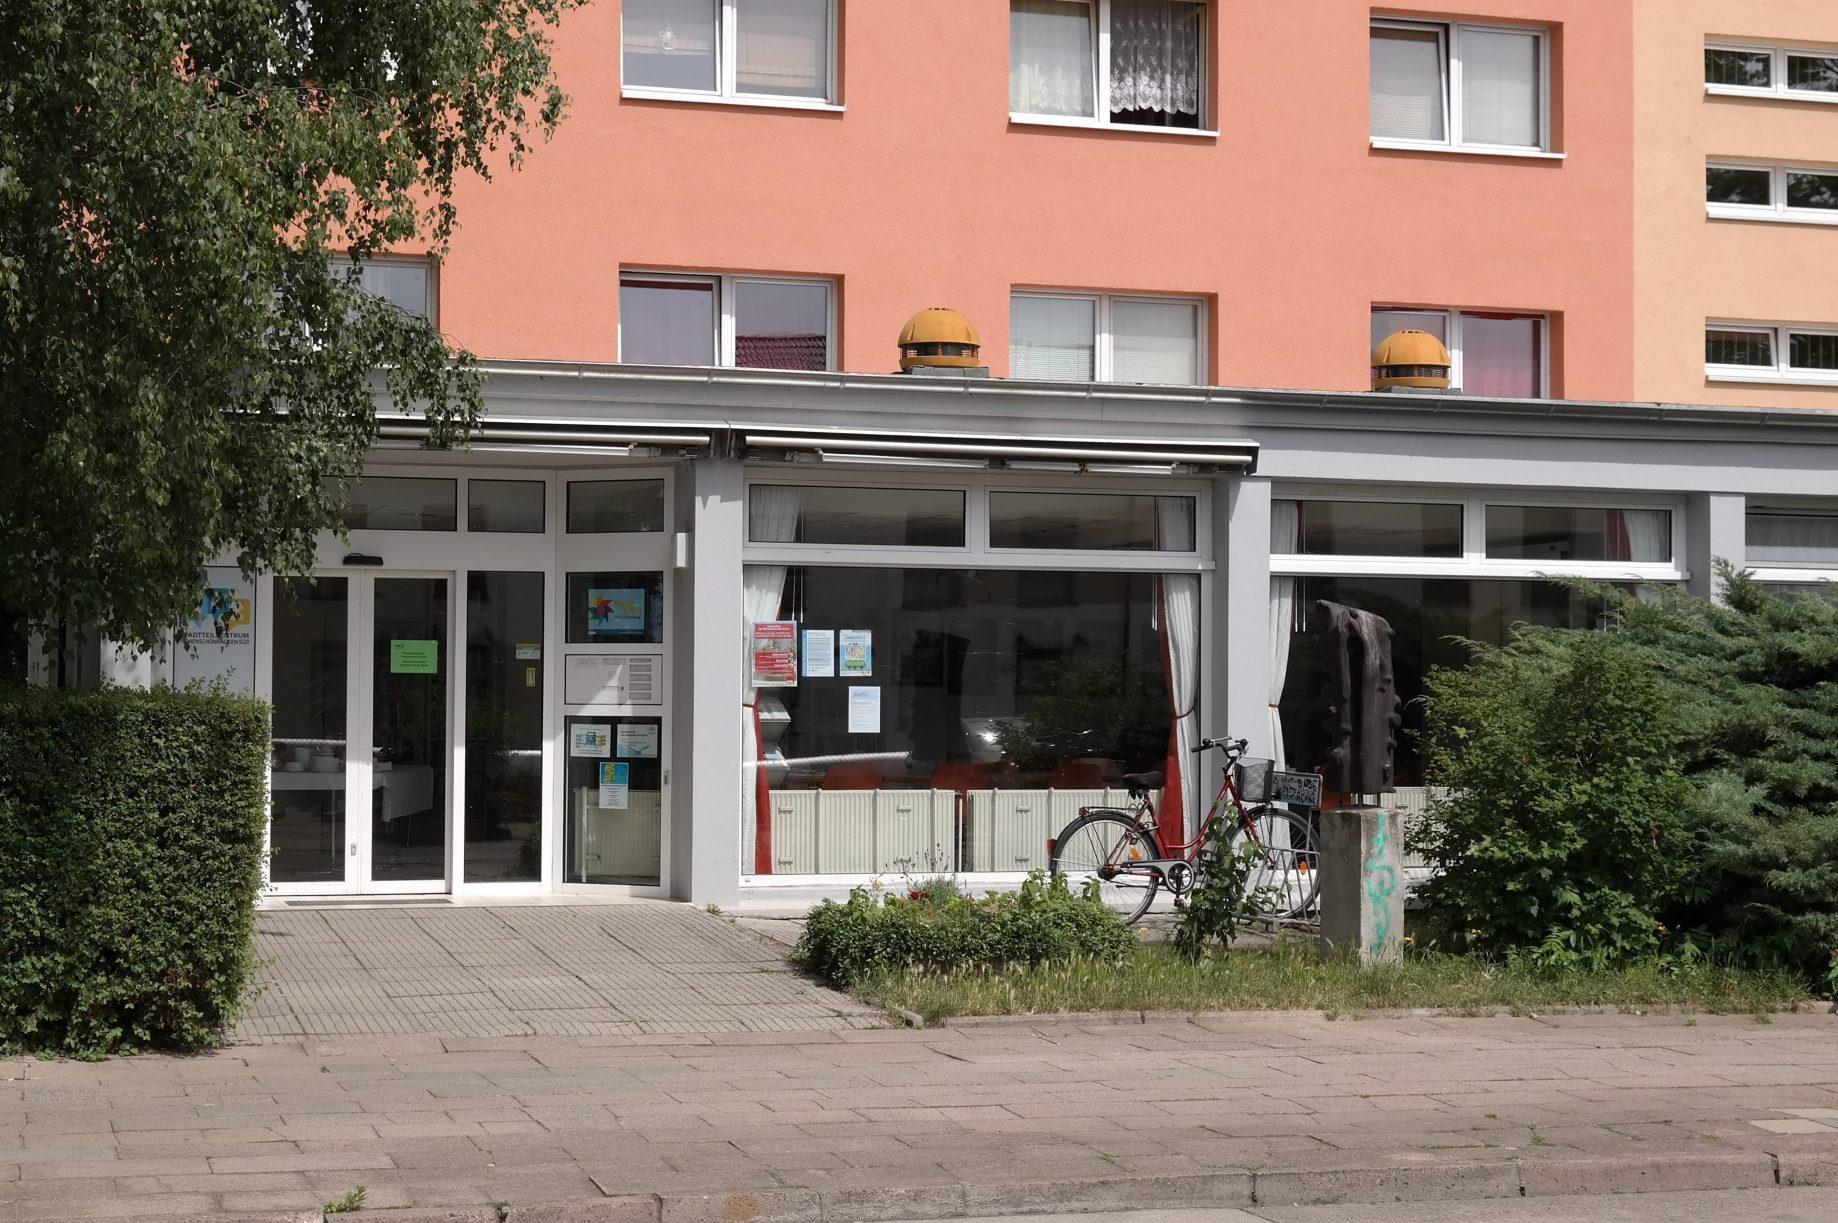 Eingang zum Stadtteilzentrum